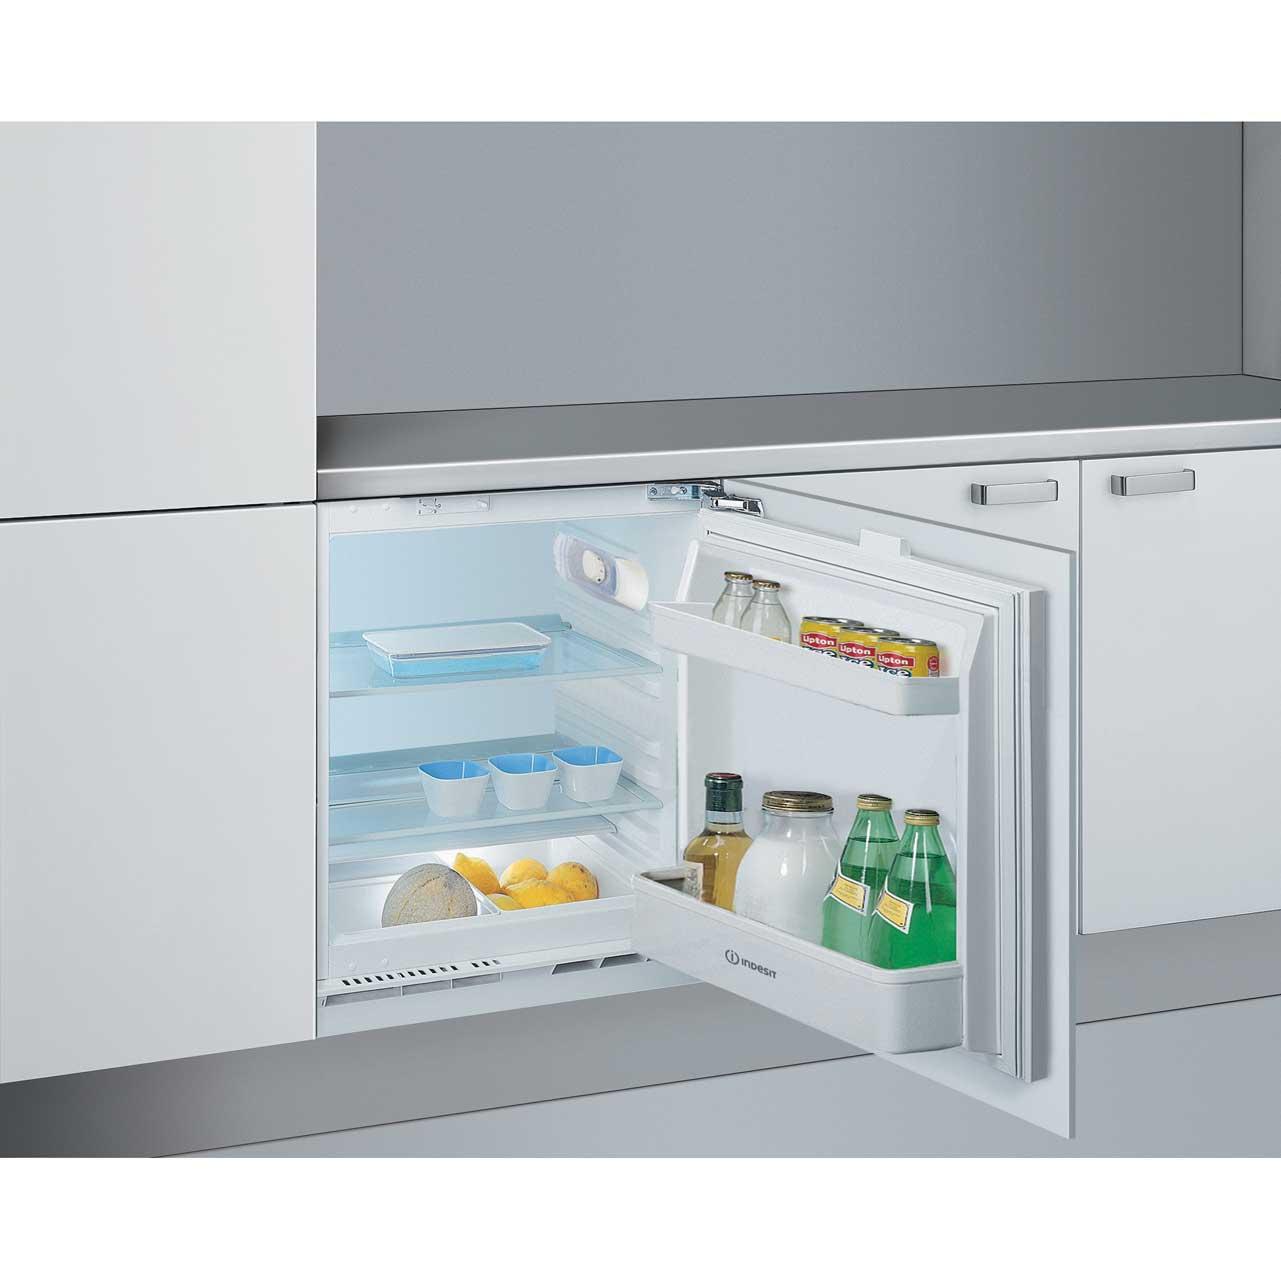 Buy Fridges And Freezers In London Indesit Ila1